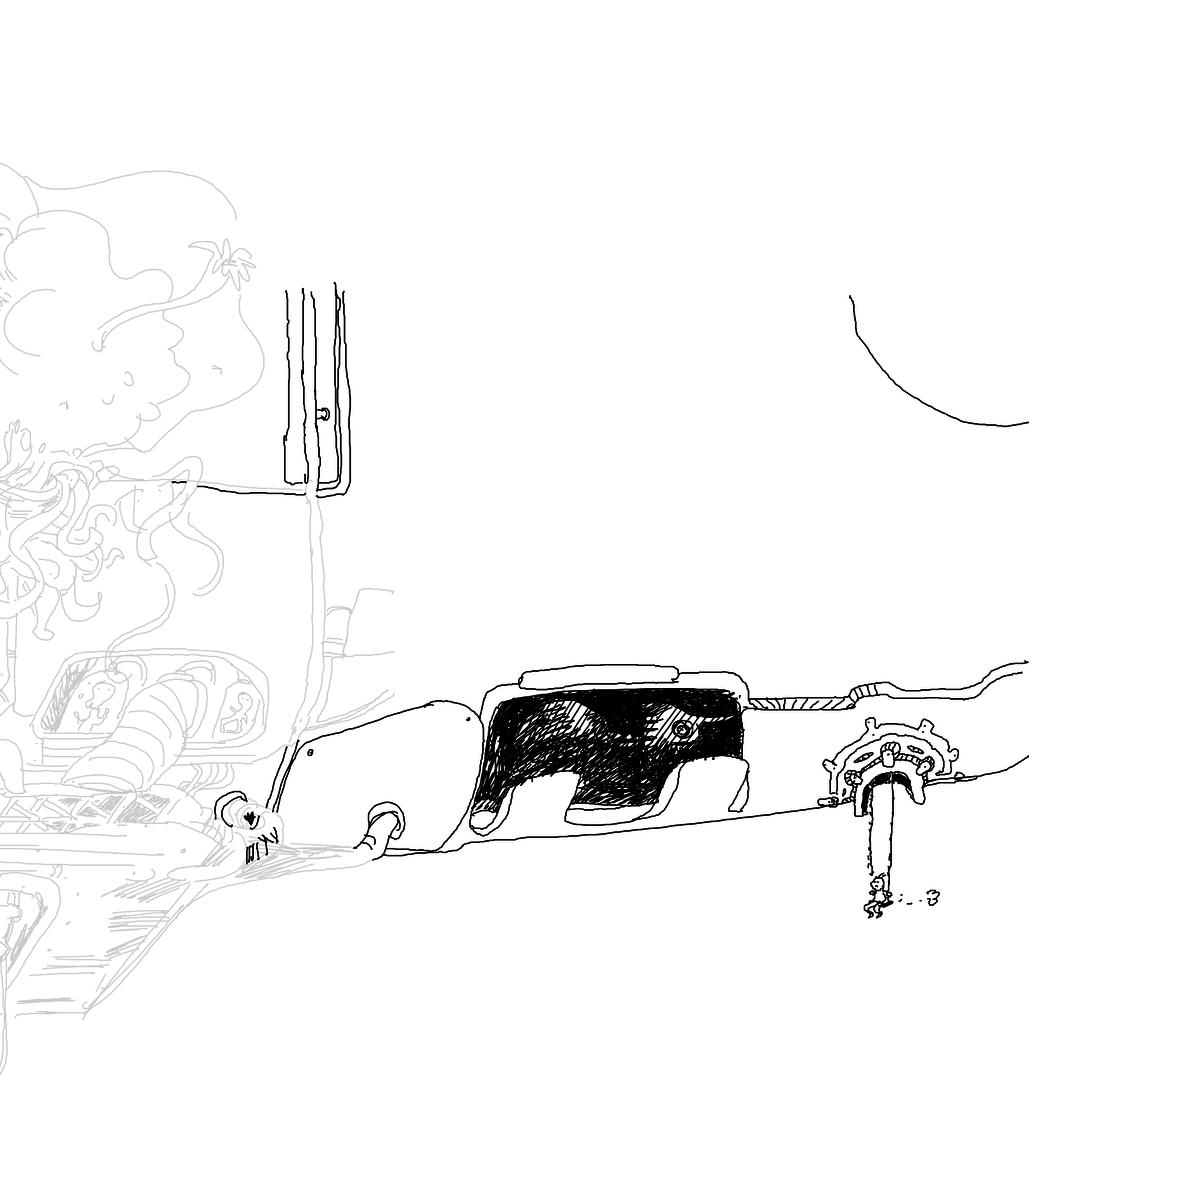 BAAAM drawing#7320 lat:78.4207992553711000lng: -4.4890255928039550